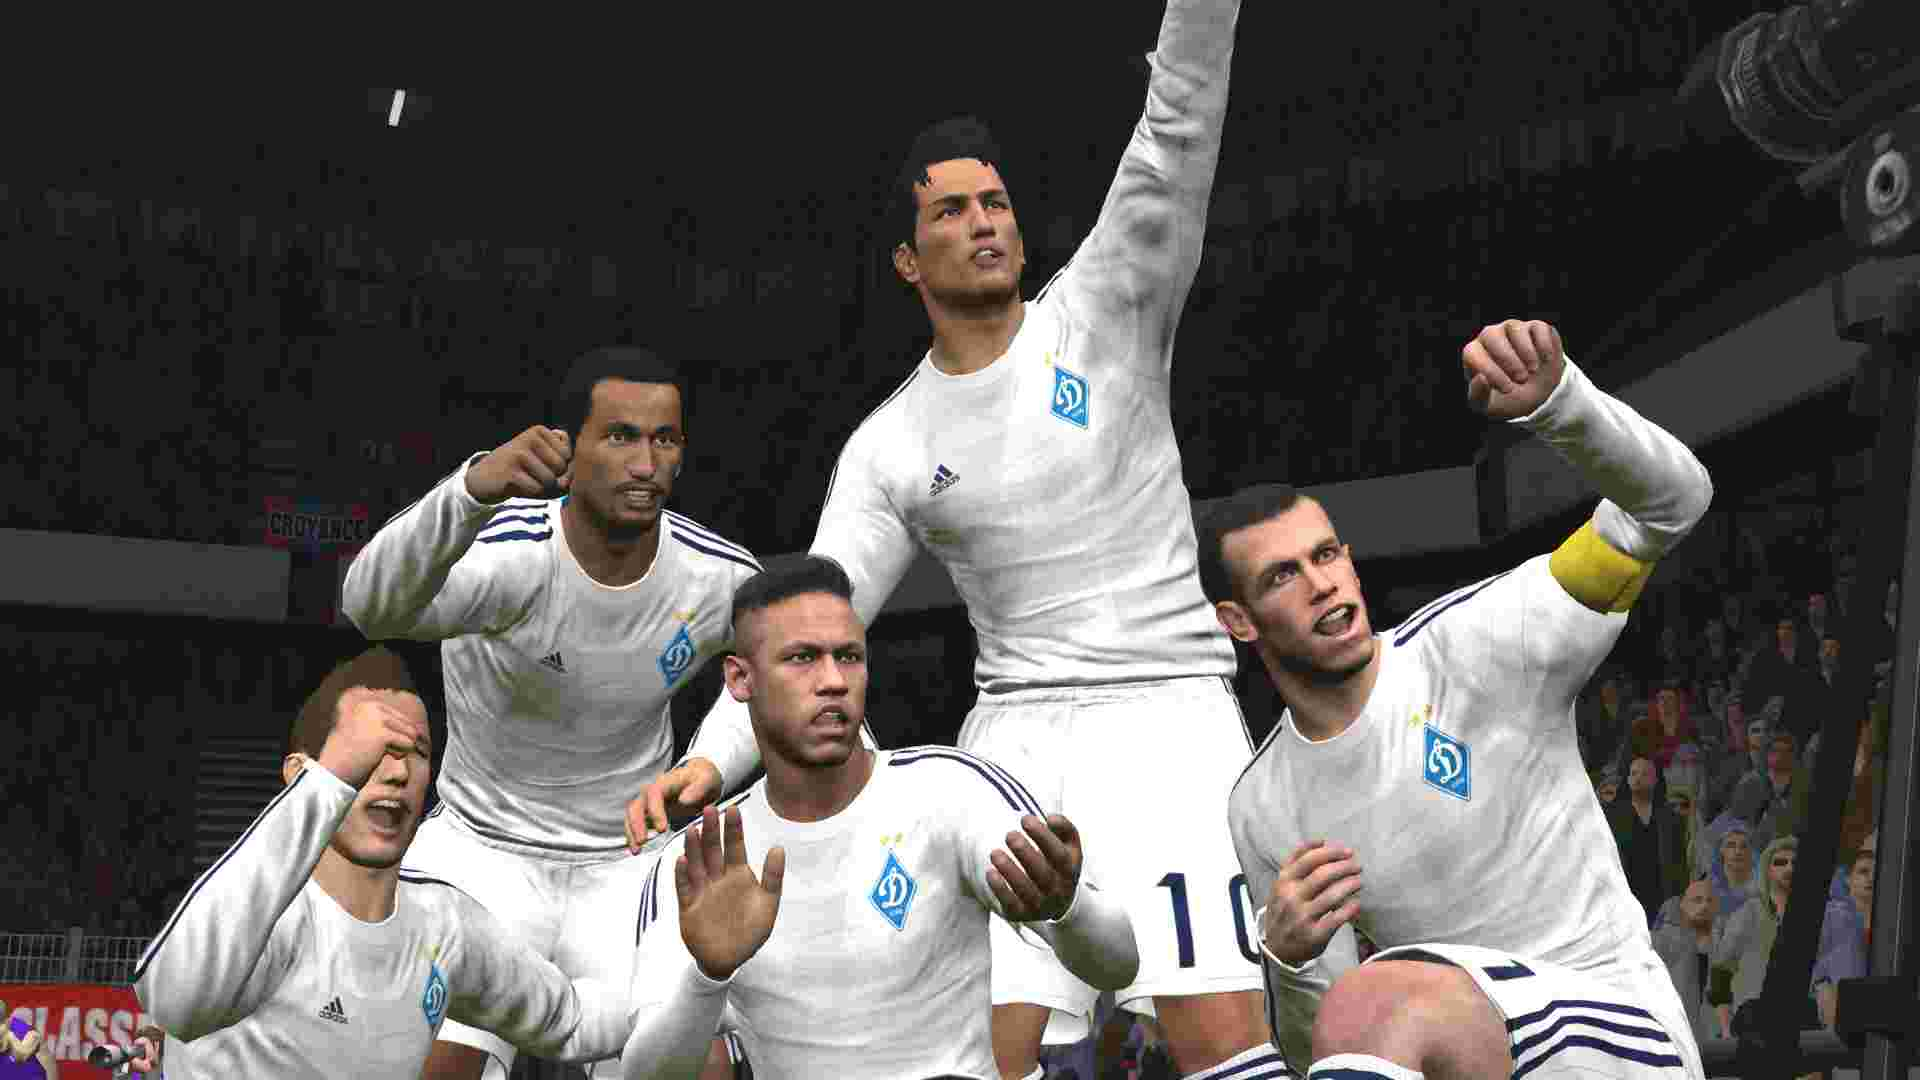 Огляд Pro Evolution Soccer 2016 | Огляд PES 2016